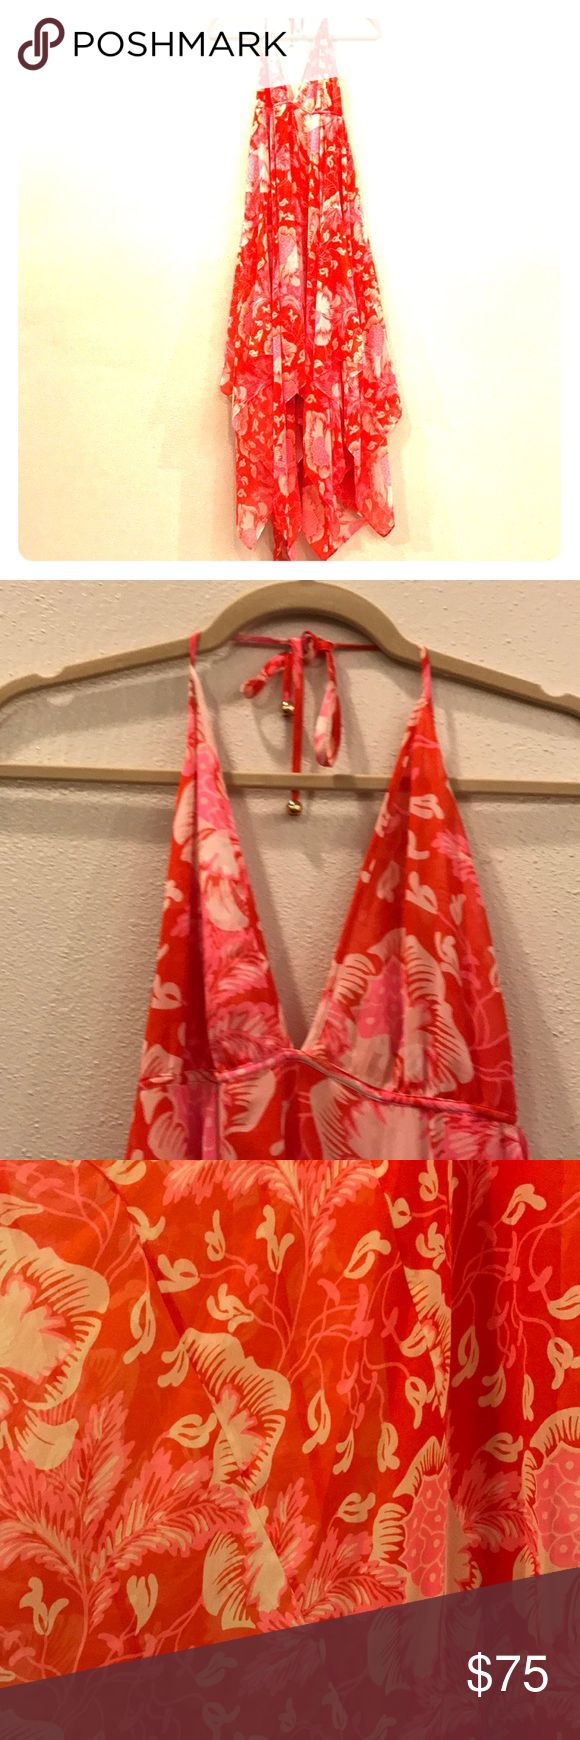 JUICY COUTURE Beautiful dress! Beautiful flowy Juicy Couture dress! Worn once! Fits 2-6 Juicy Couture Dresses Backless